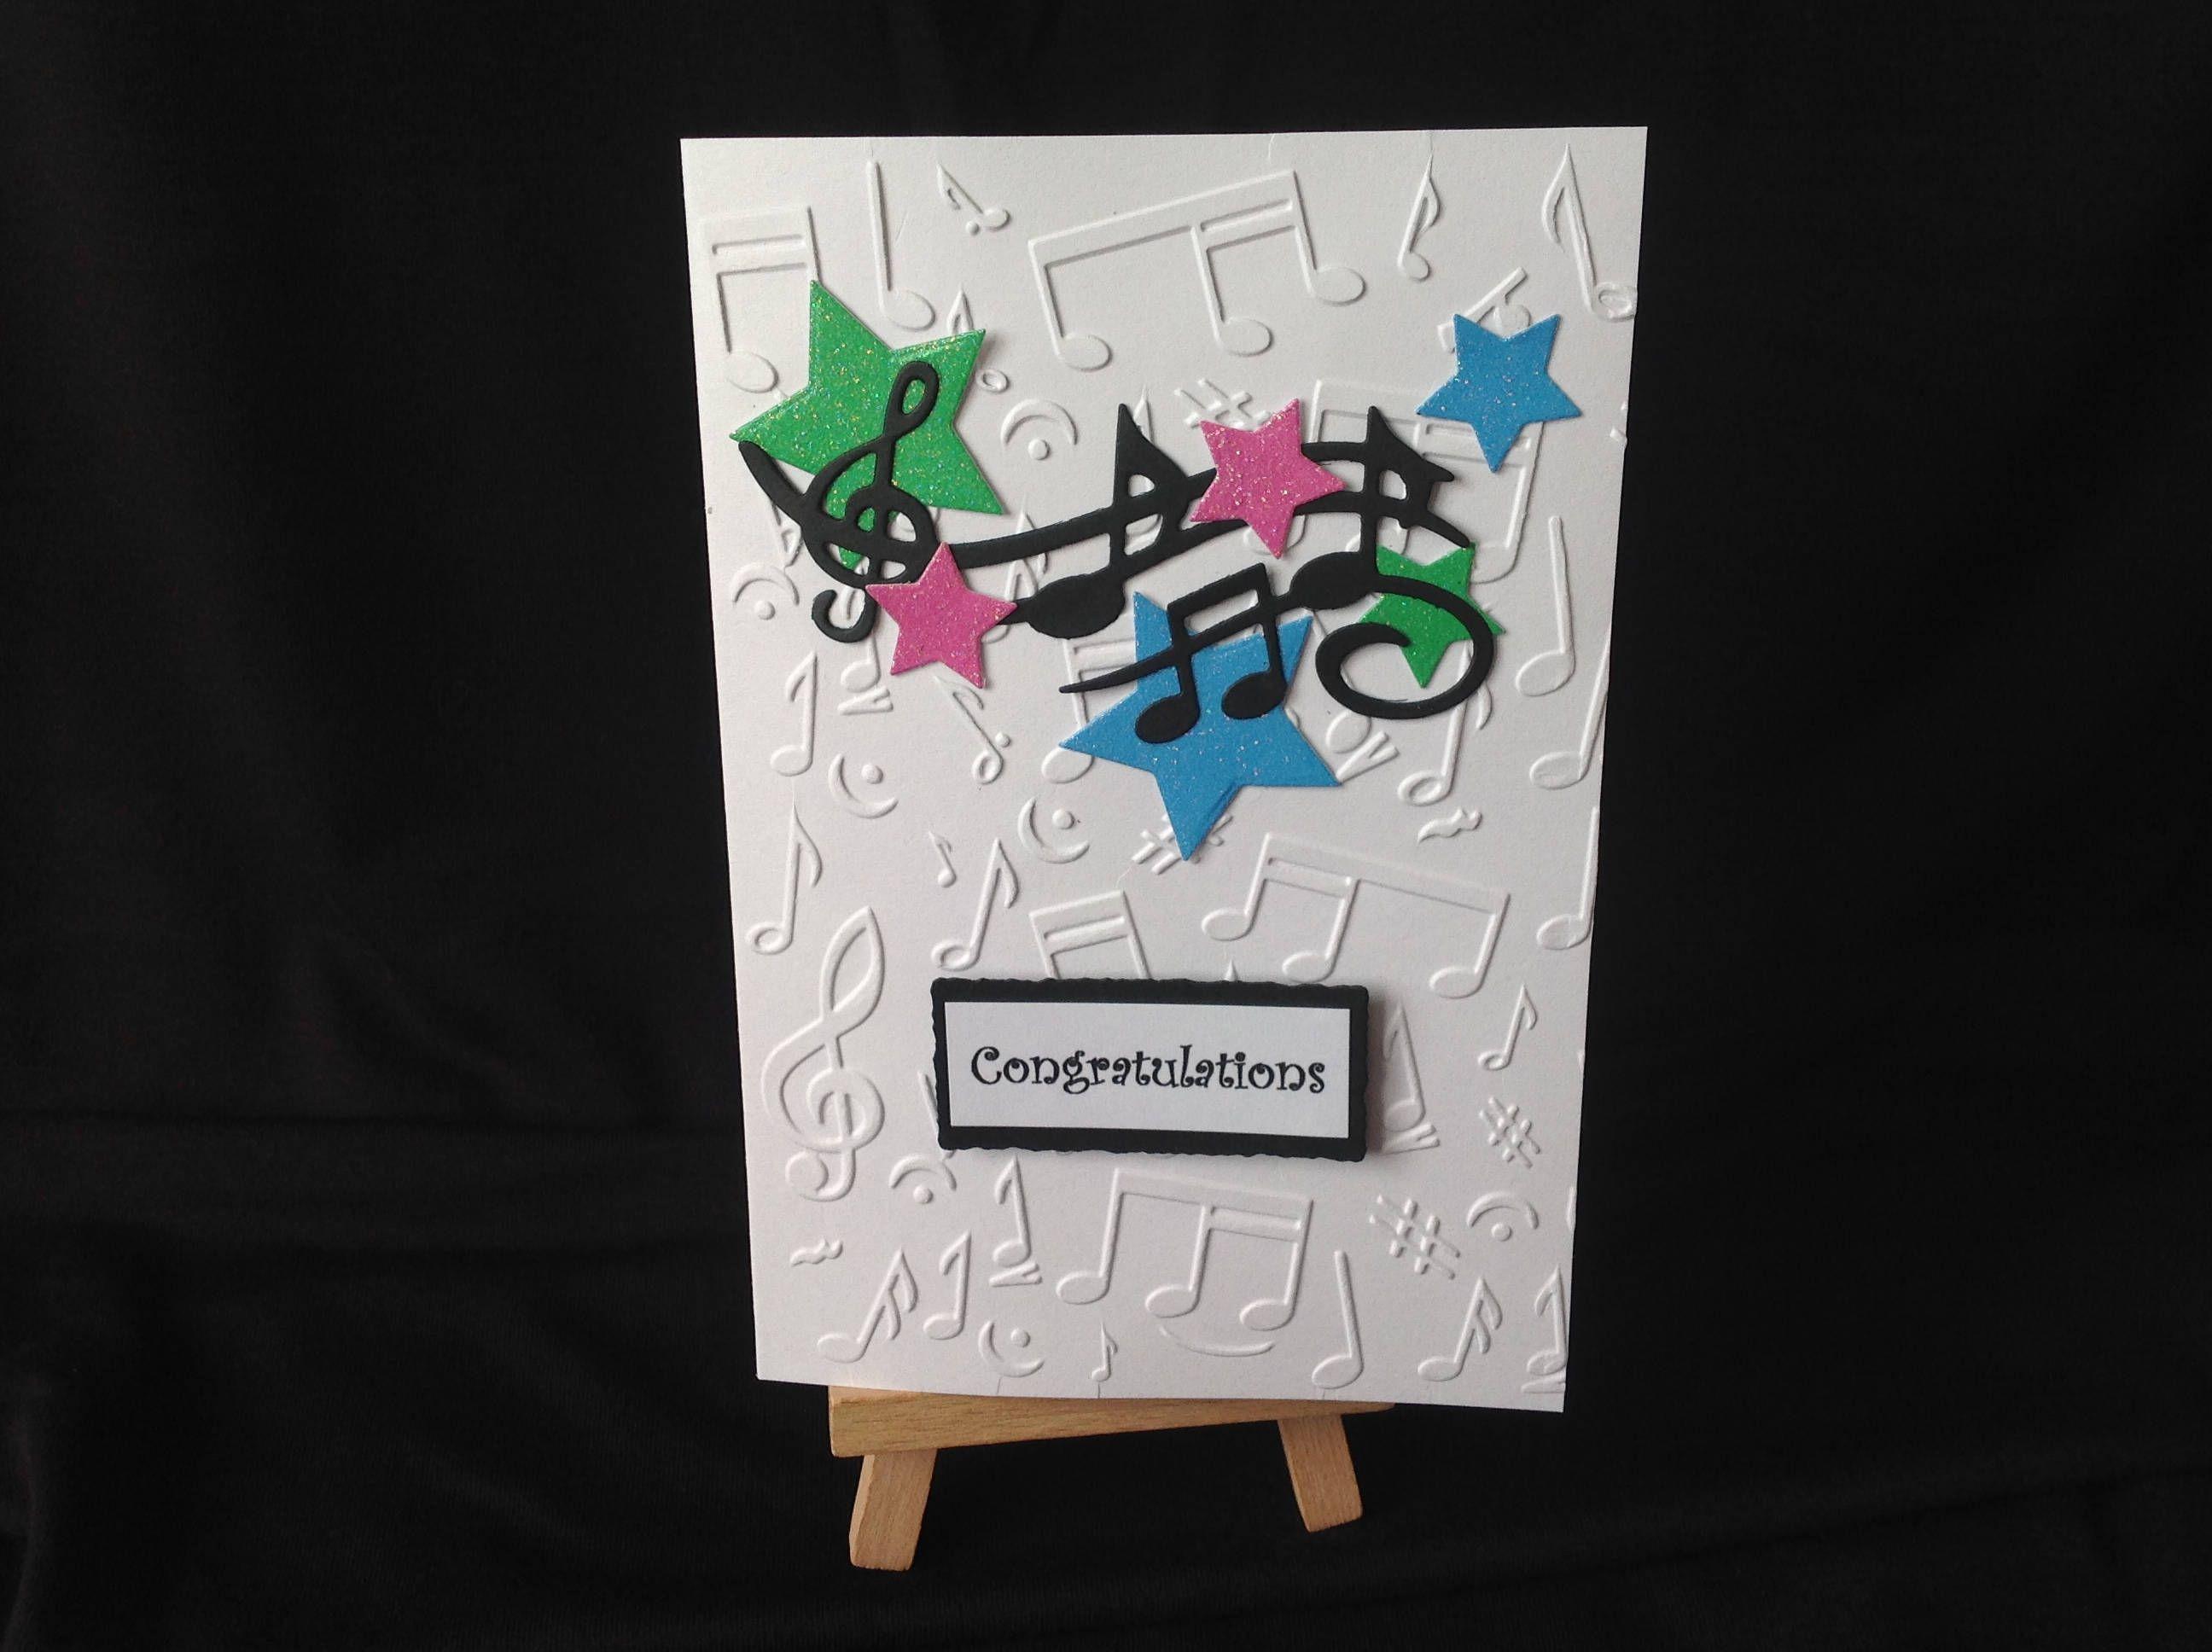 Music Exam Success Or Congratulations Card Handmade Brillante By